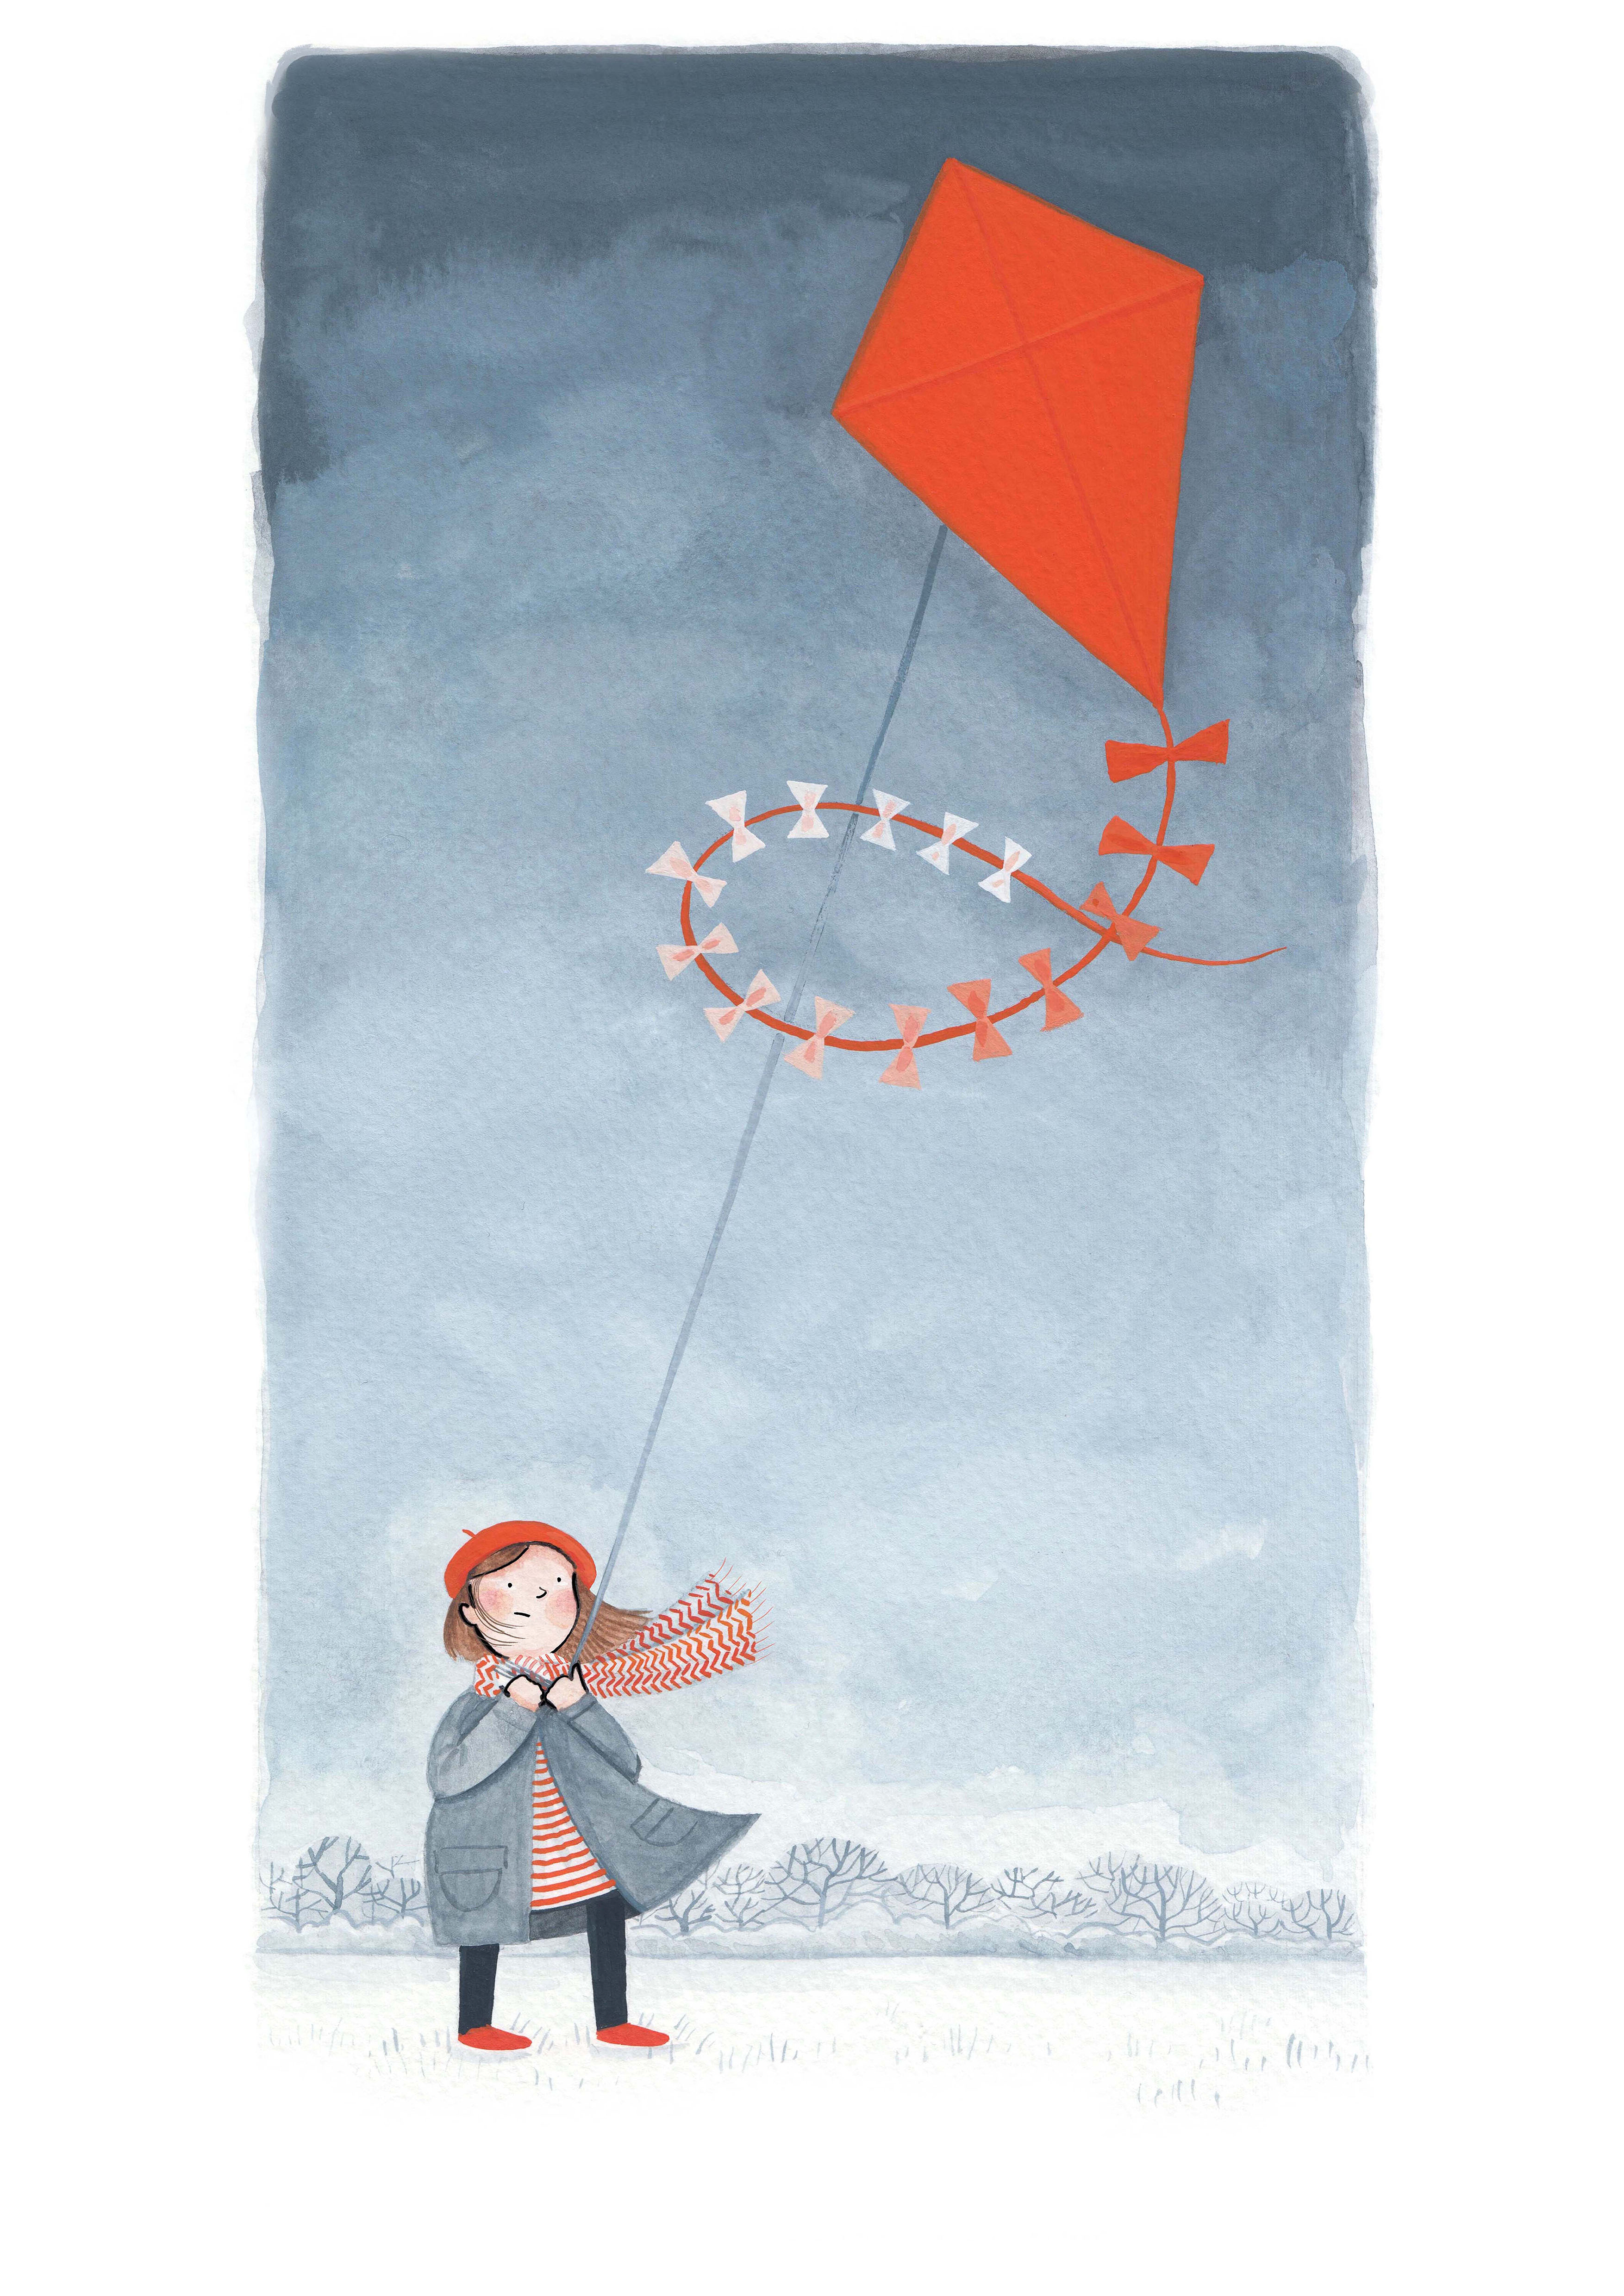 Kite - Penny Neville-Lee